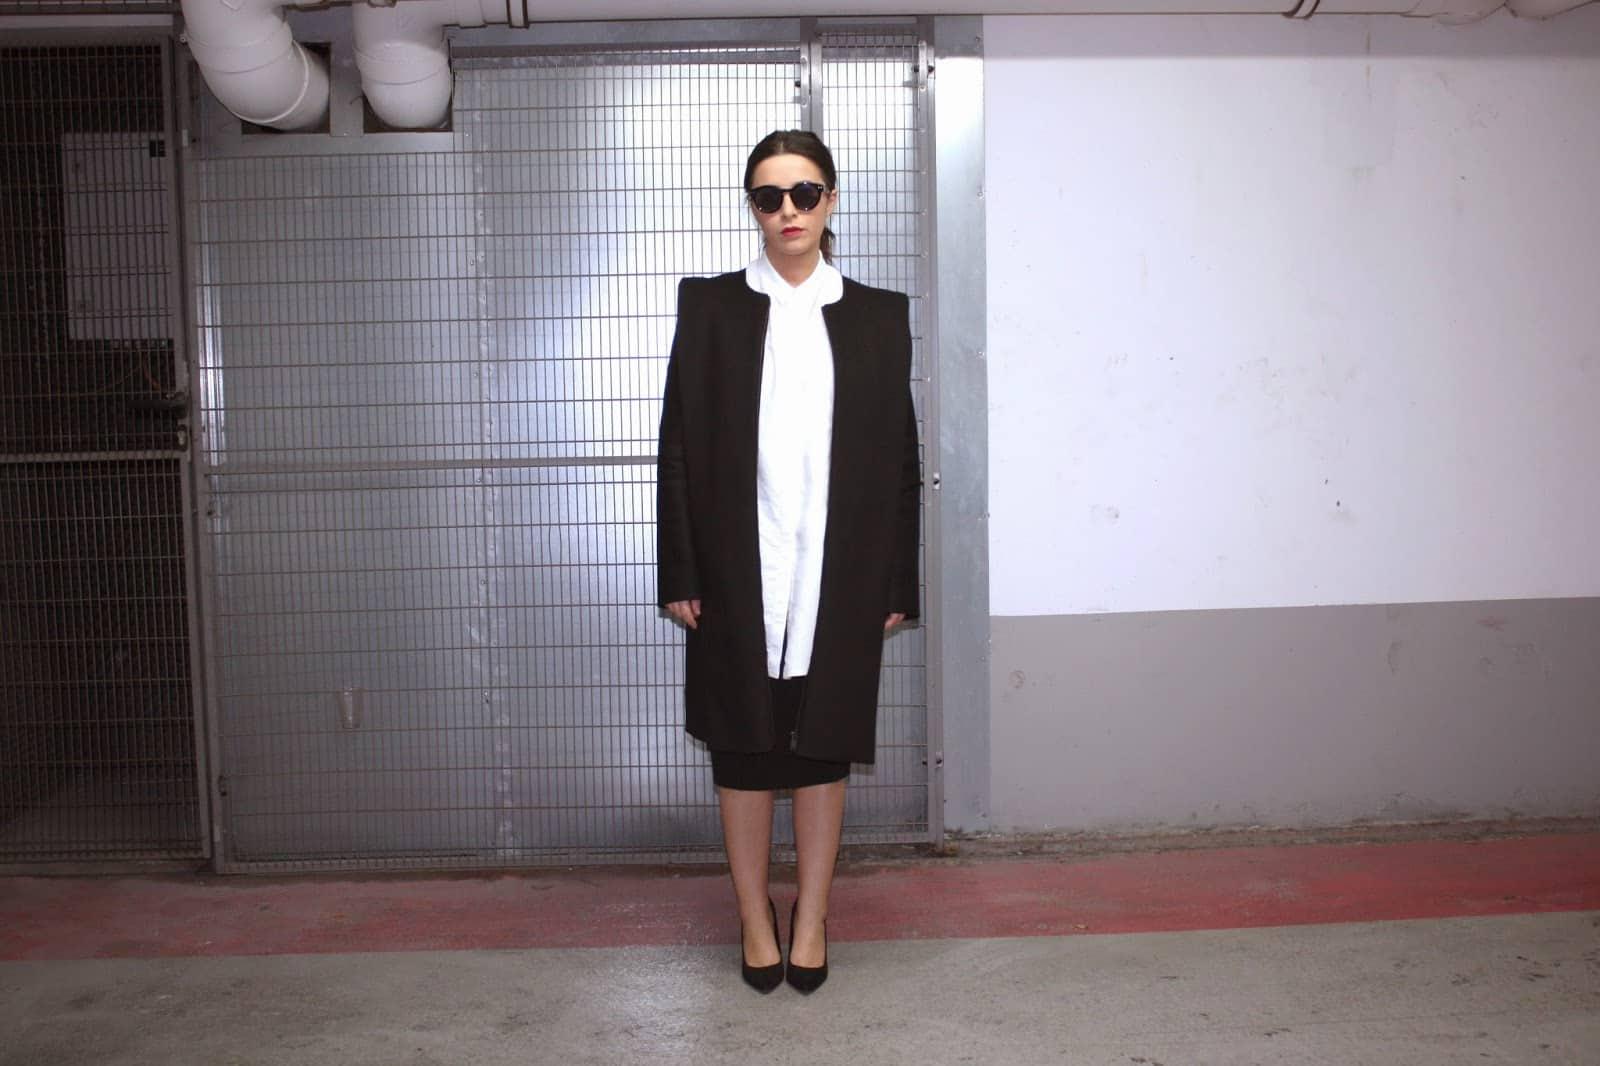 hanss-vescovi-blog-mode-marseille-tendance-minimale